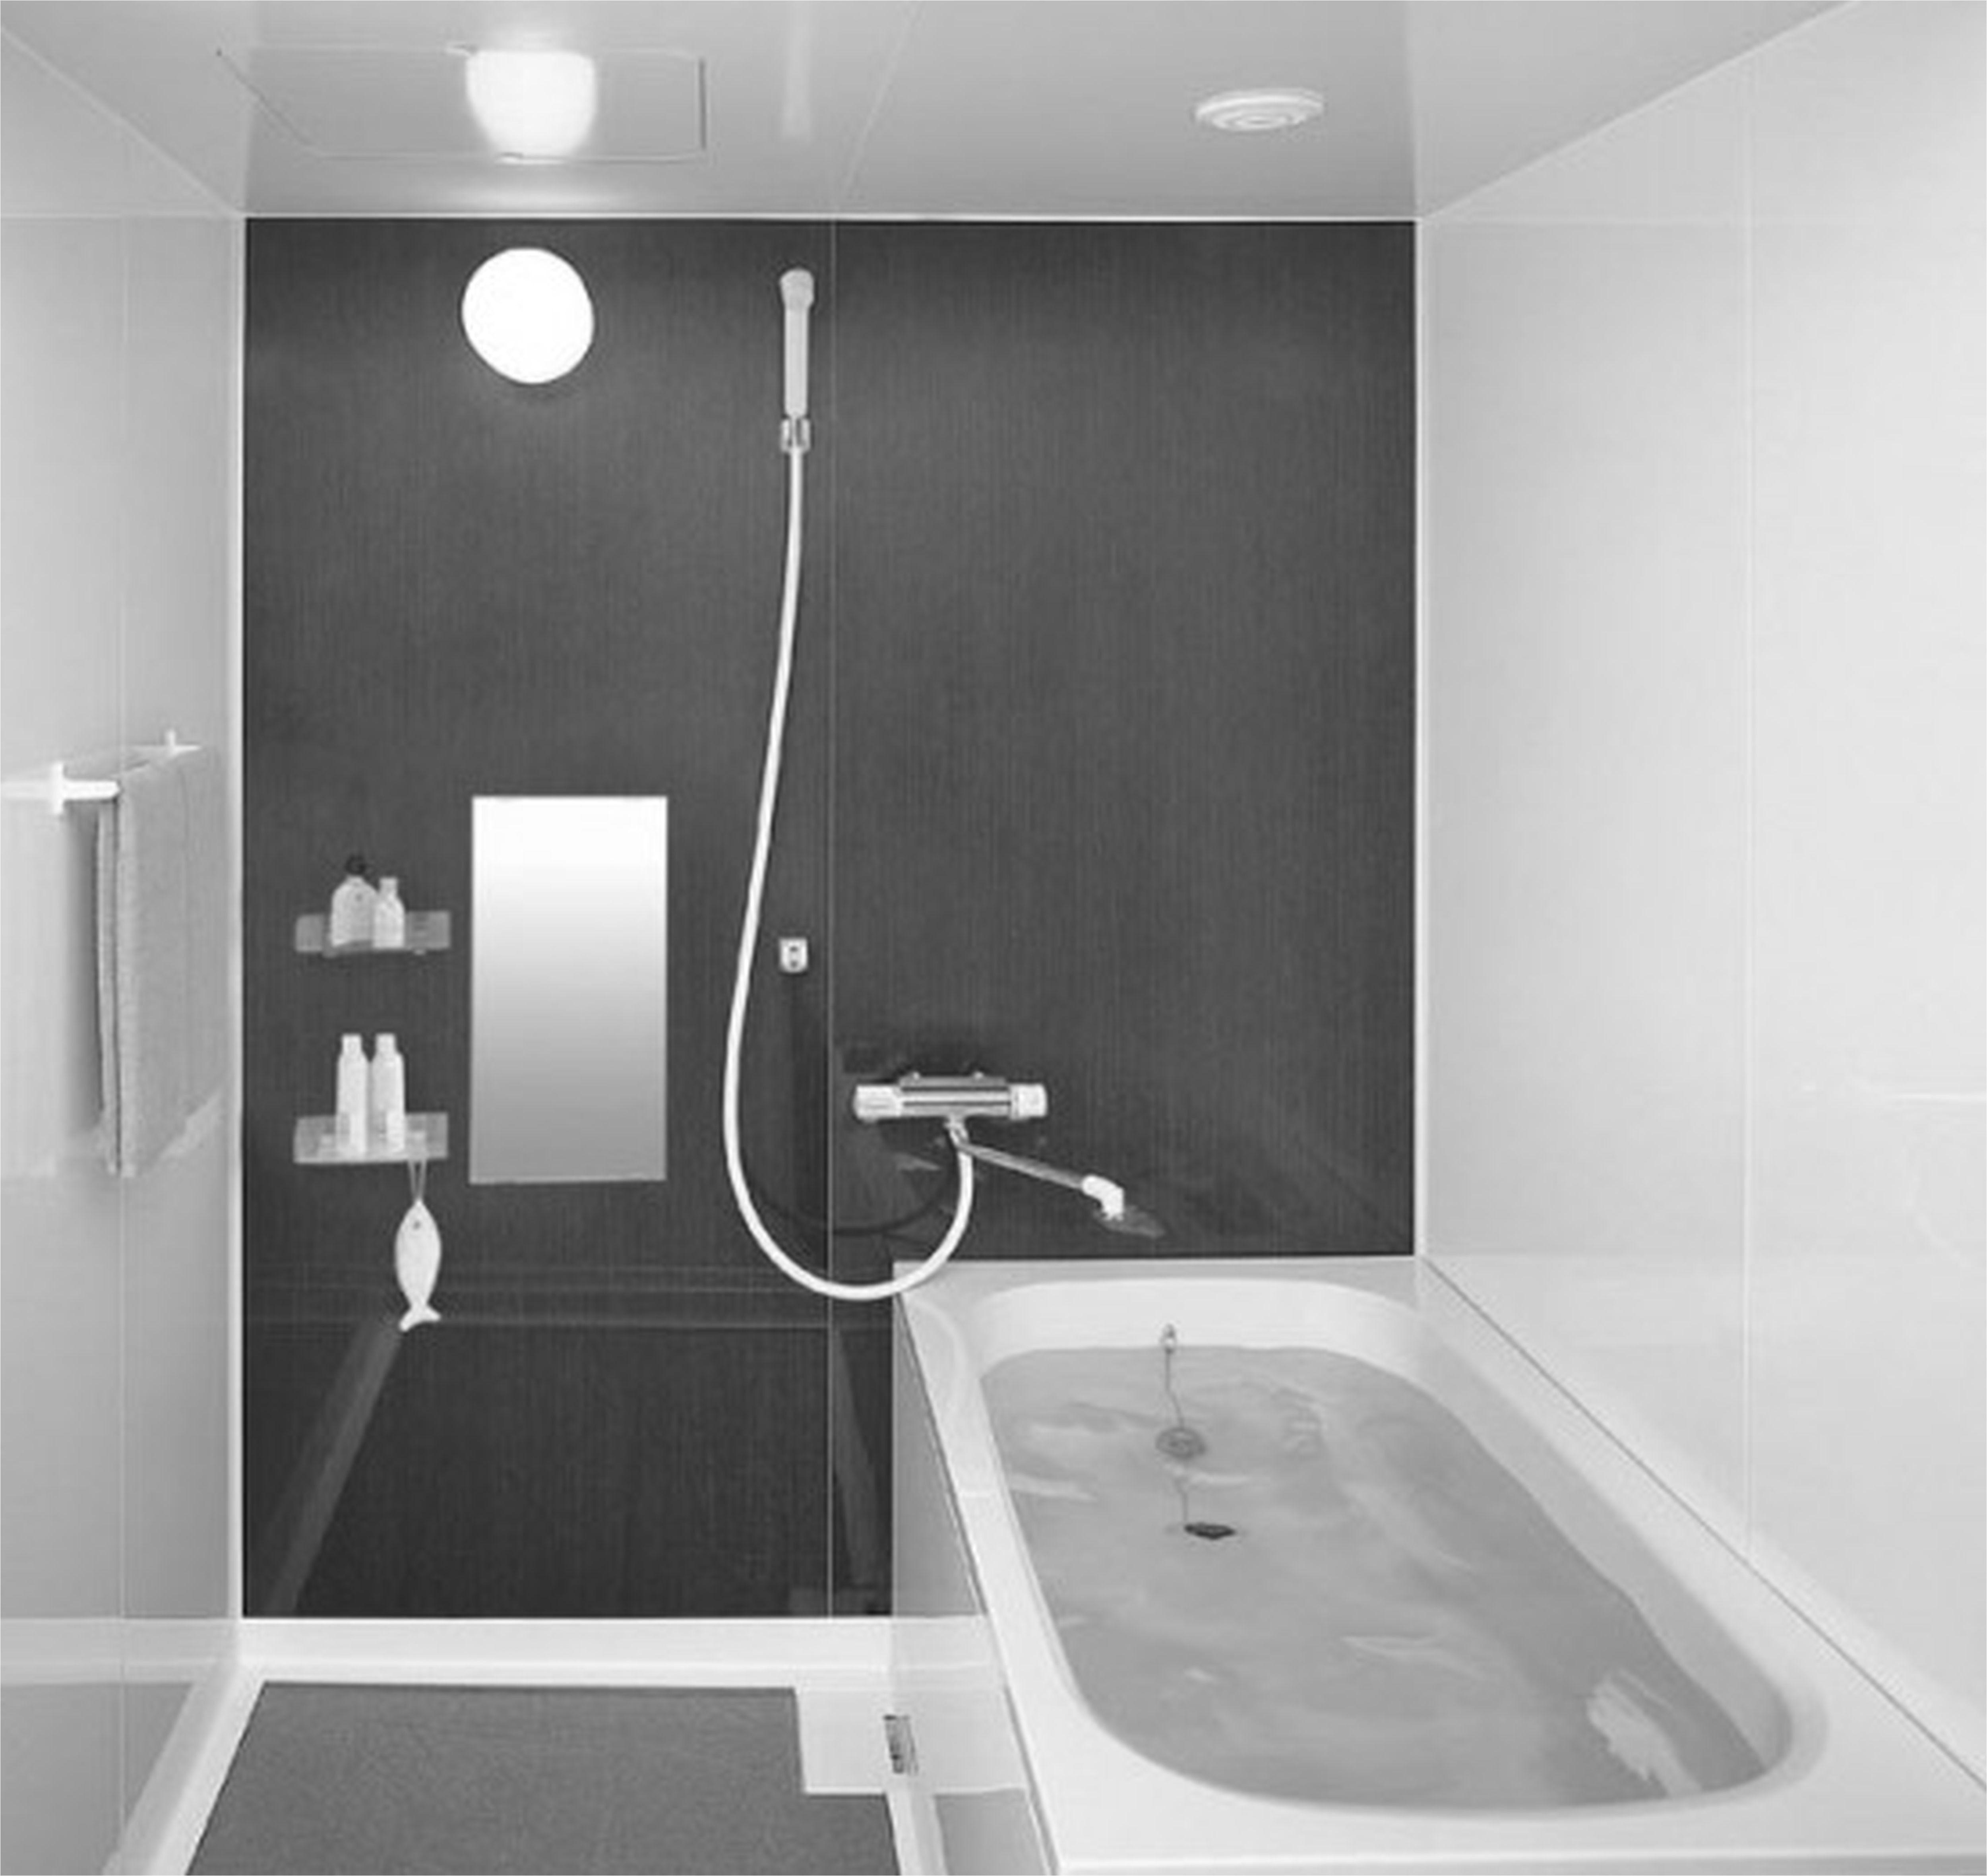 Home Tile Design Ideas Valid Elegant Tiles for Bathroom Beautiful Tile Ideas Gray 0d Than Modern